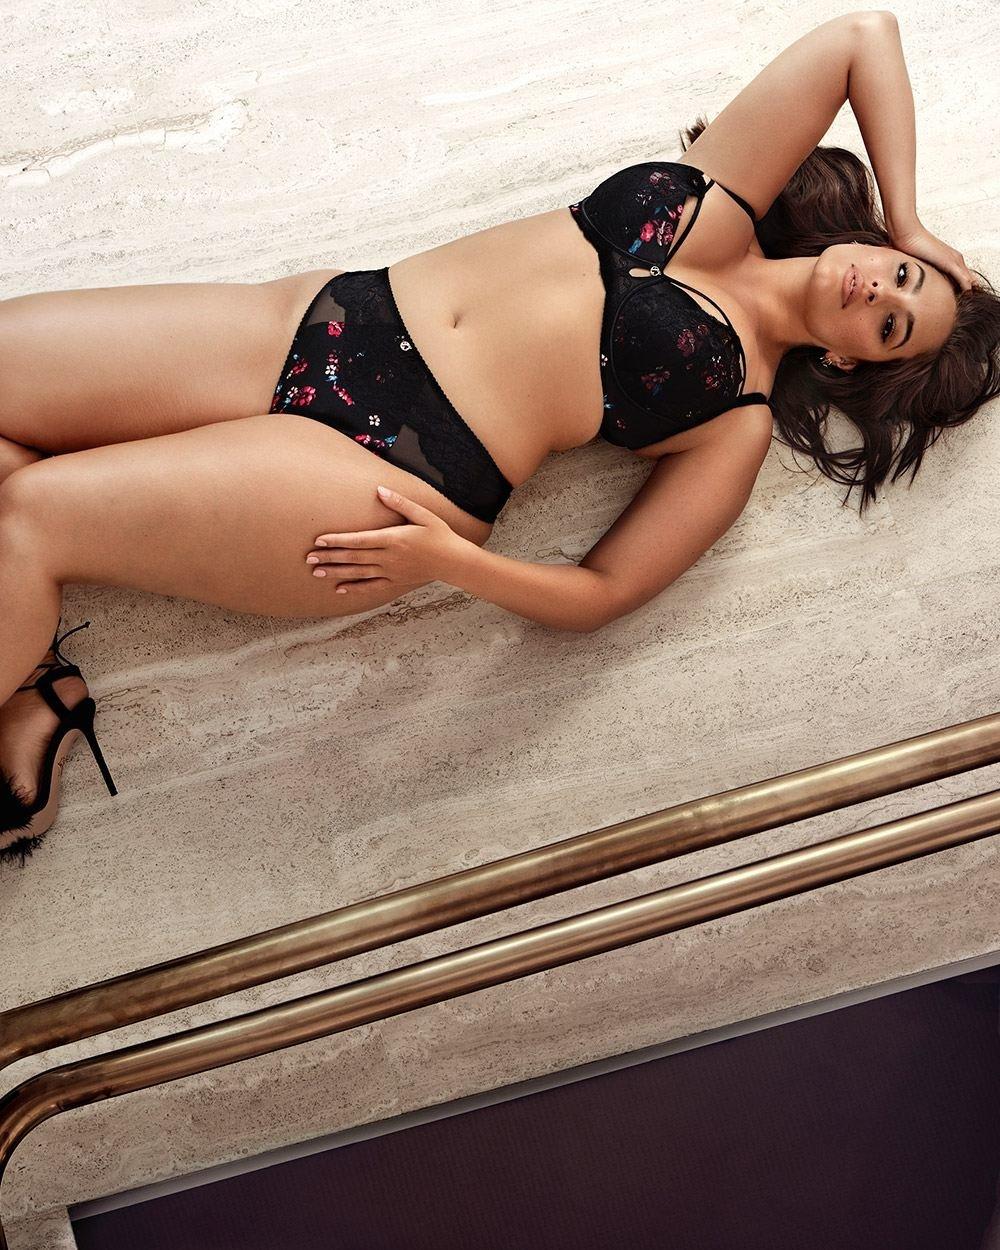 Watch celebrity sex videos free